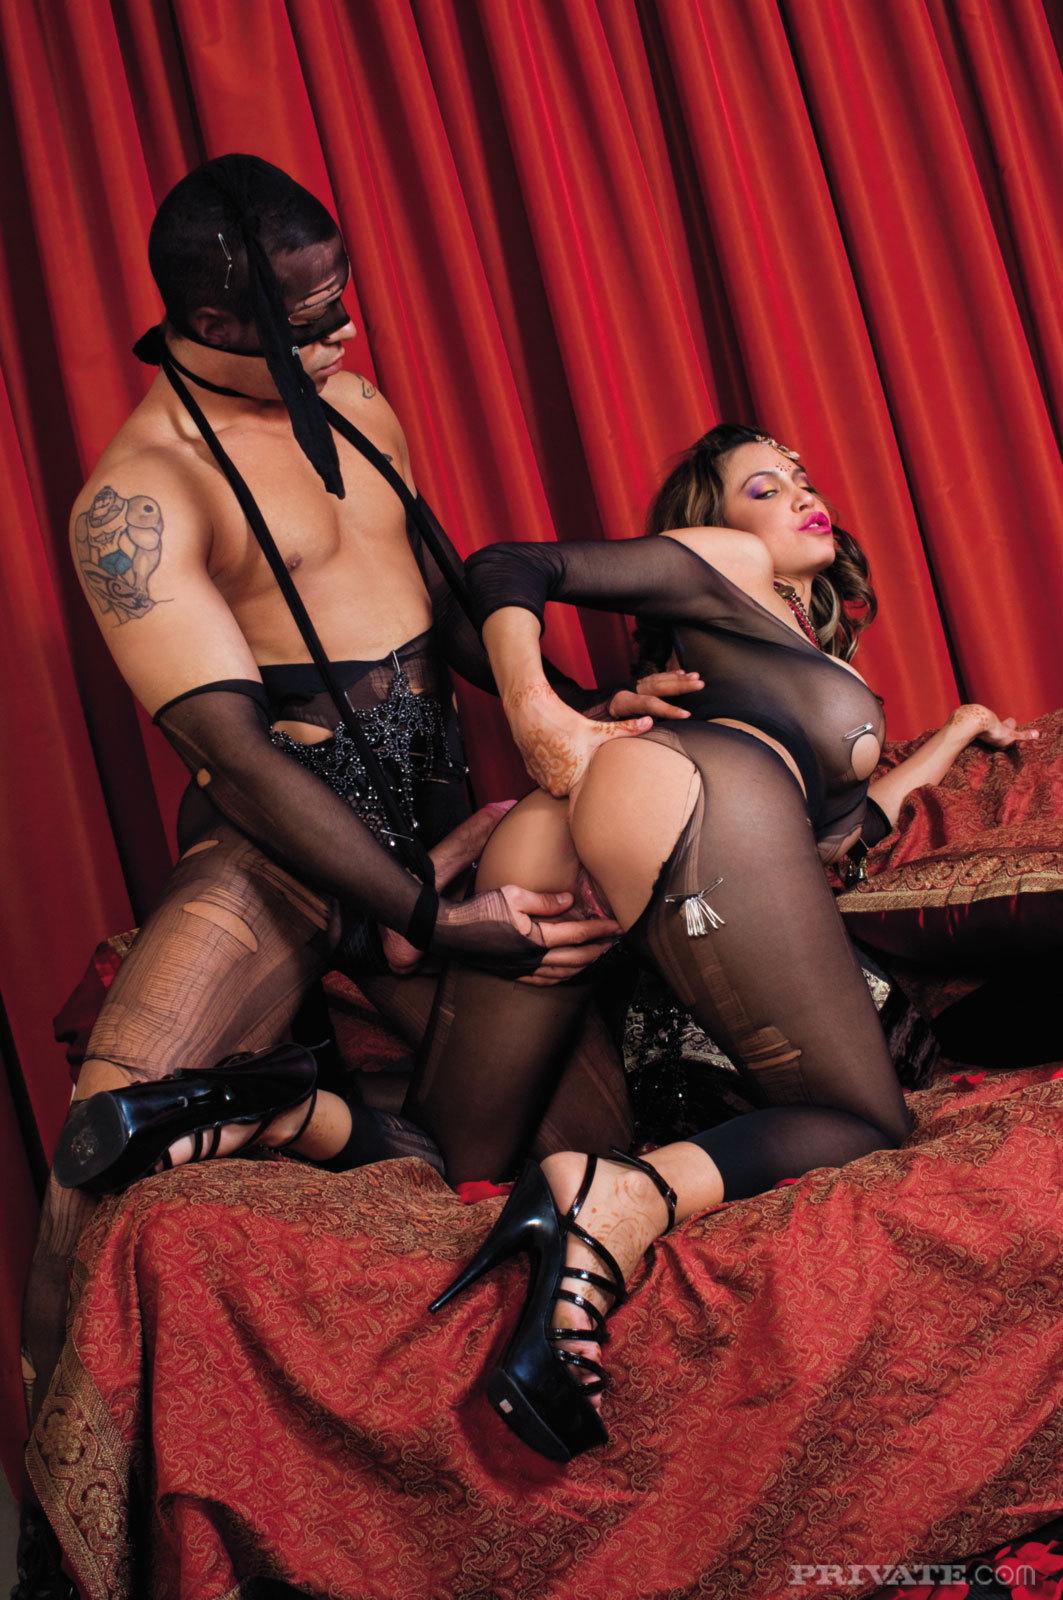 Busty Pornstar Karina - Hardcore Sex - picture 11